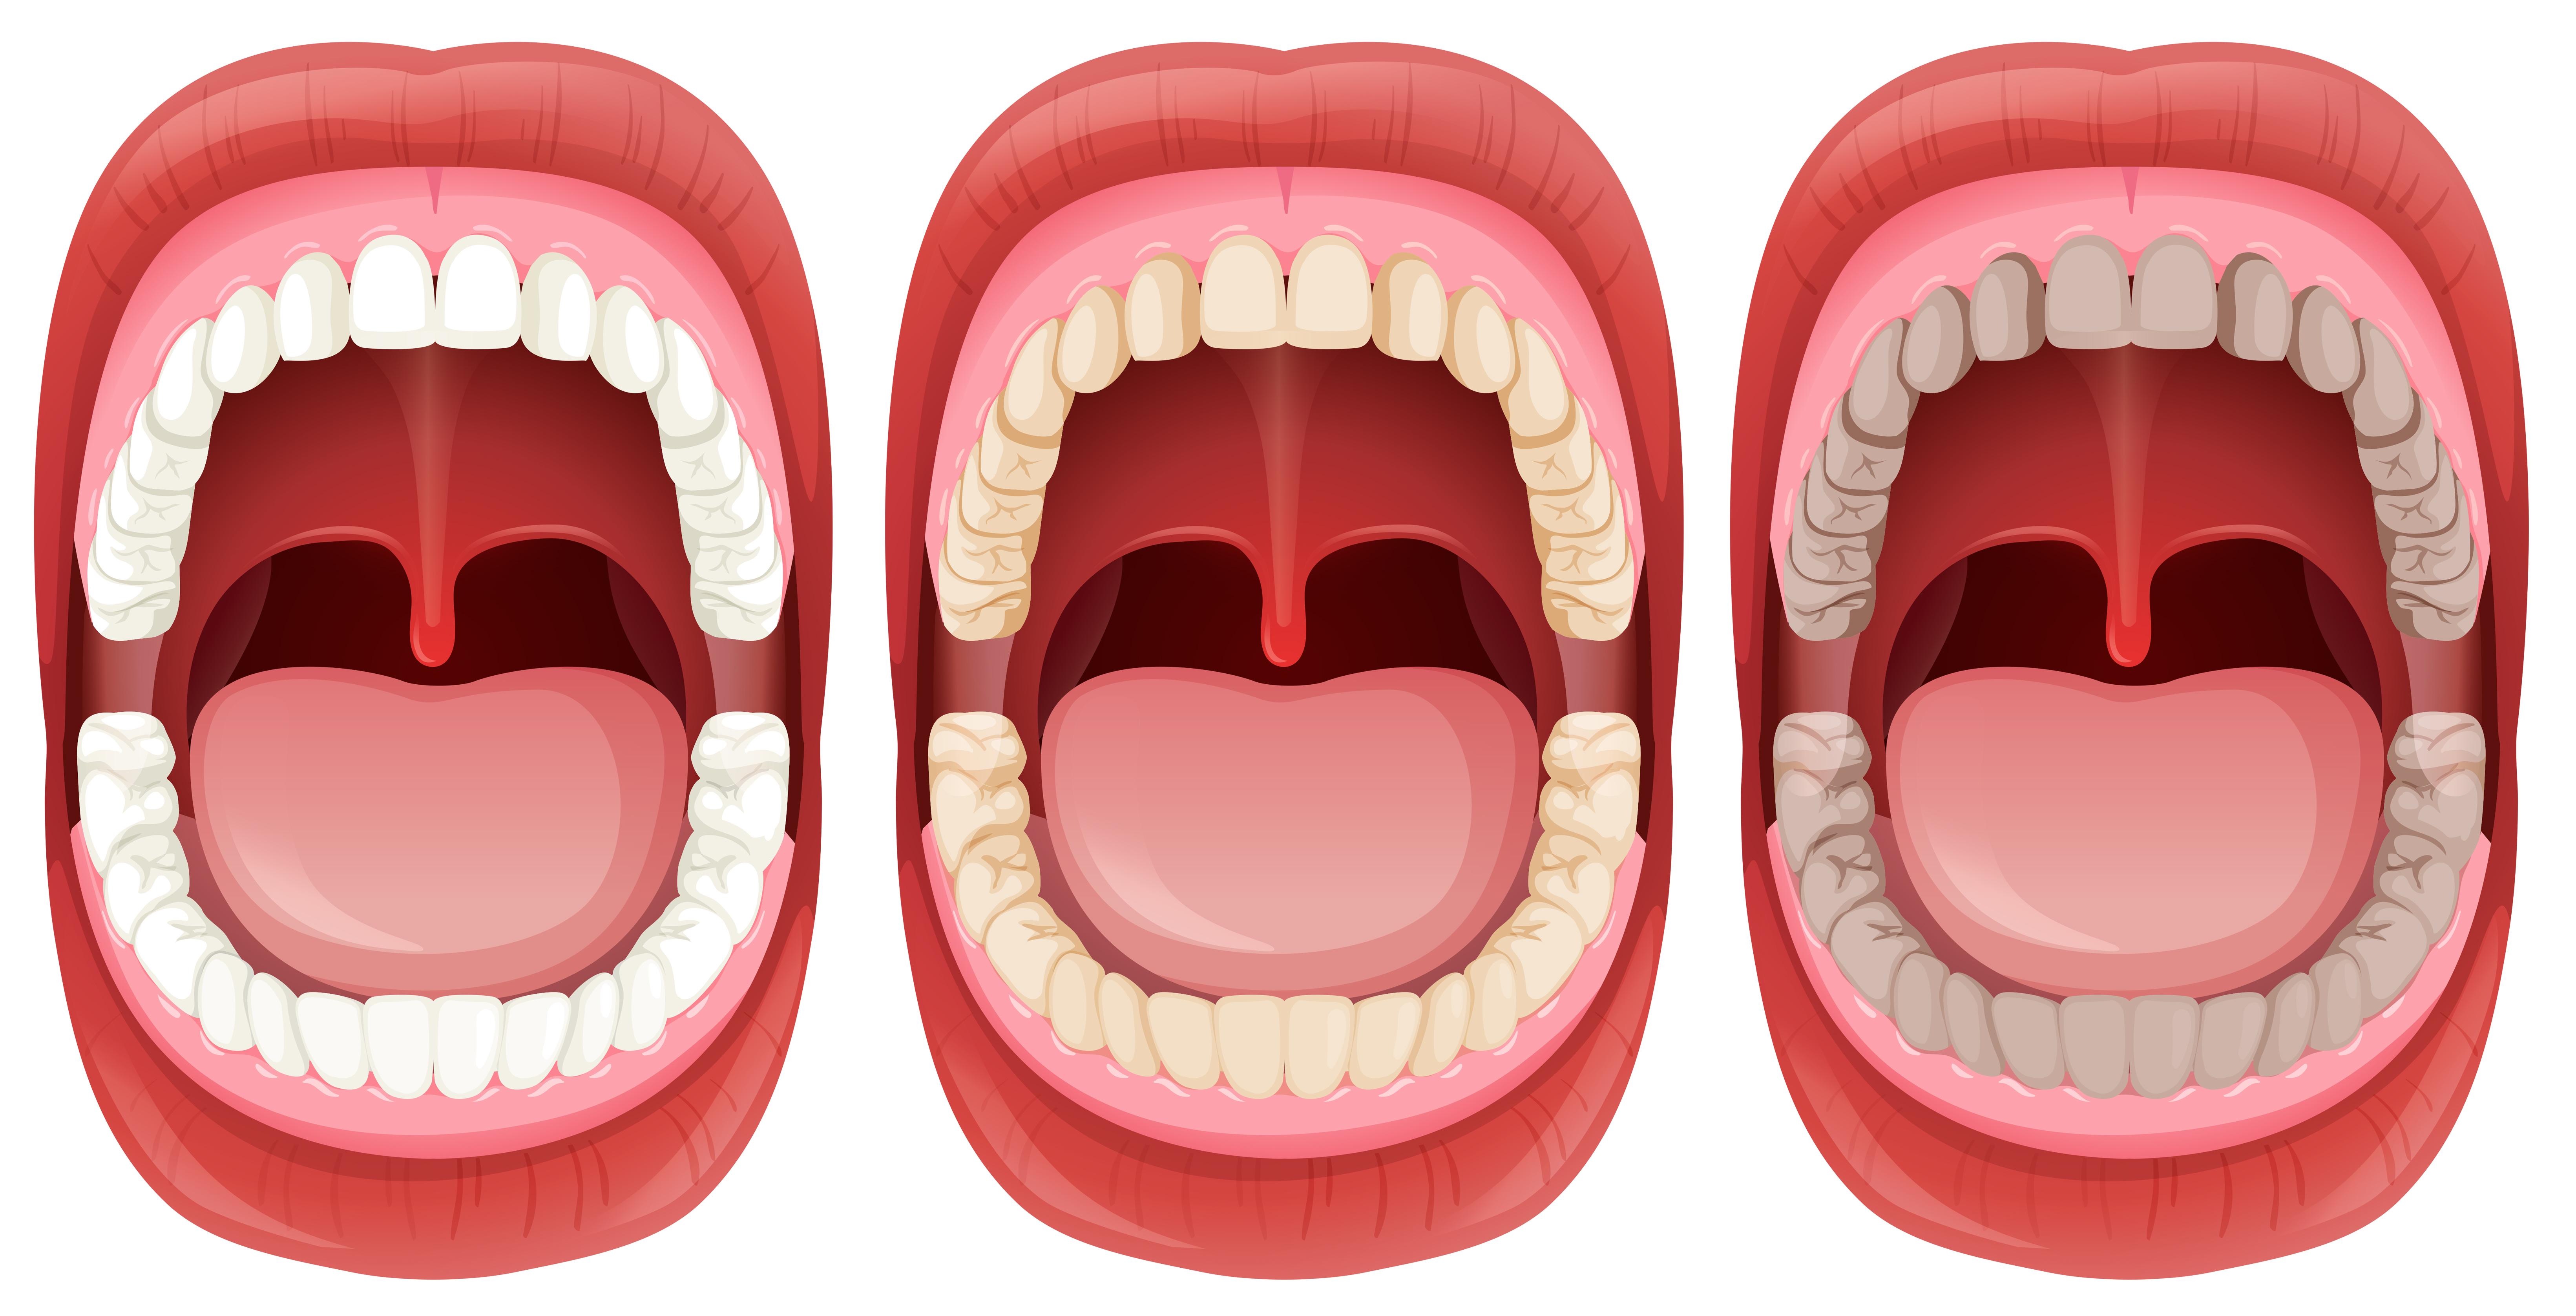 A Set Of Human Mouth Anatomy